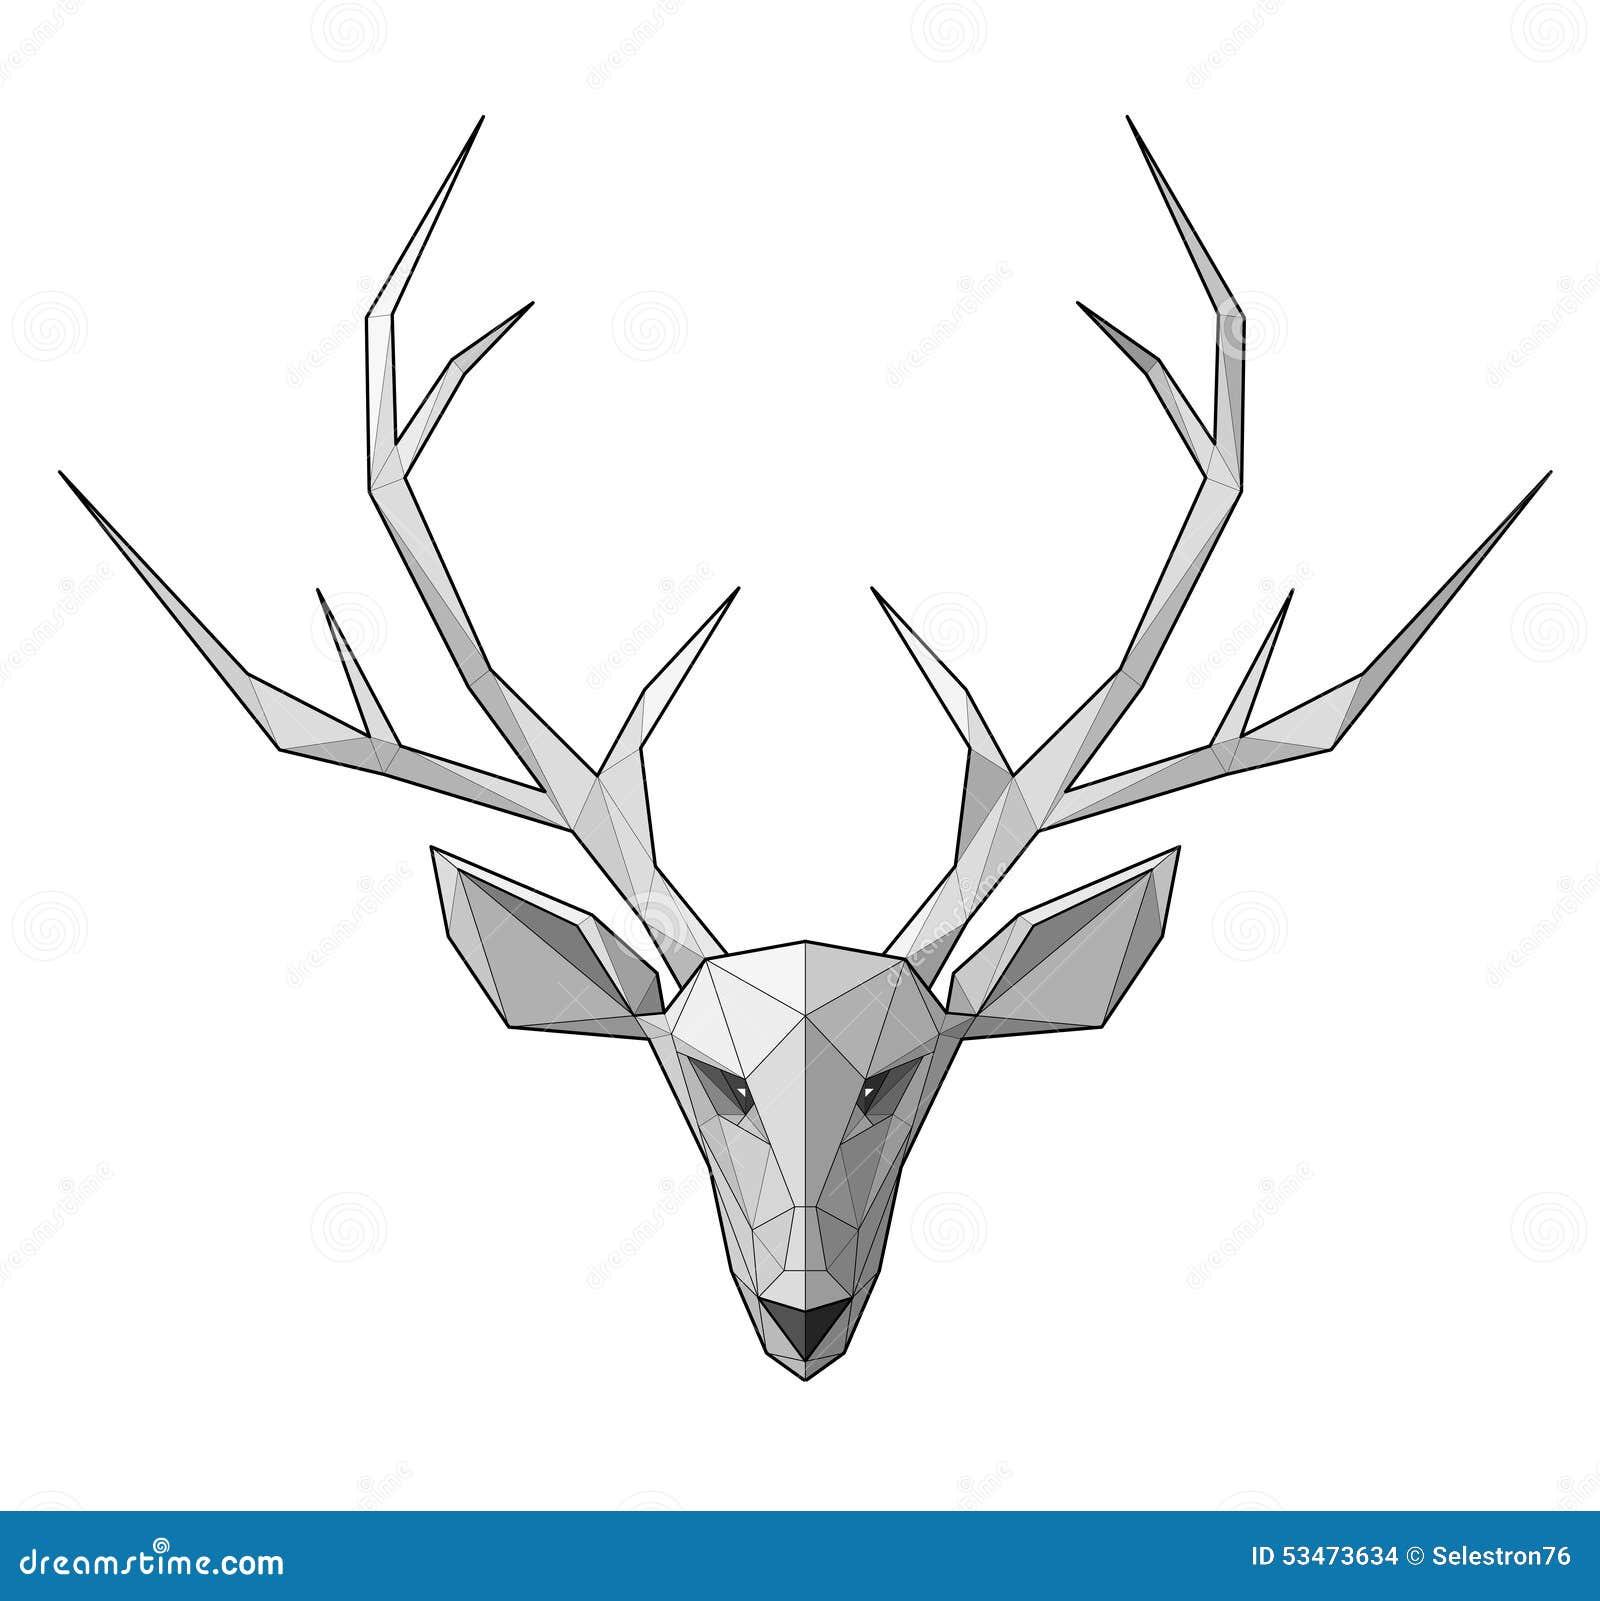 deer gray low poly - photo #27